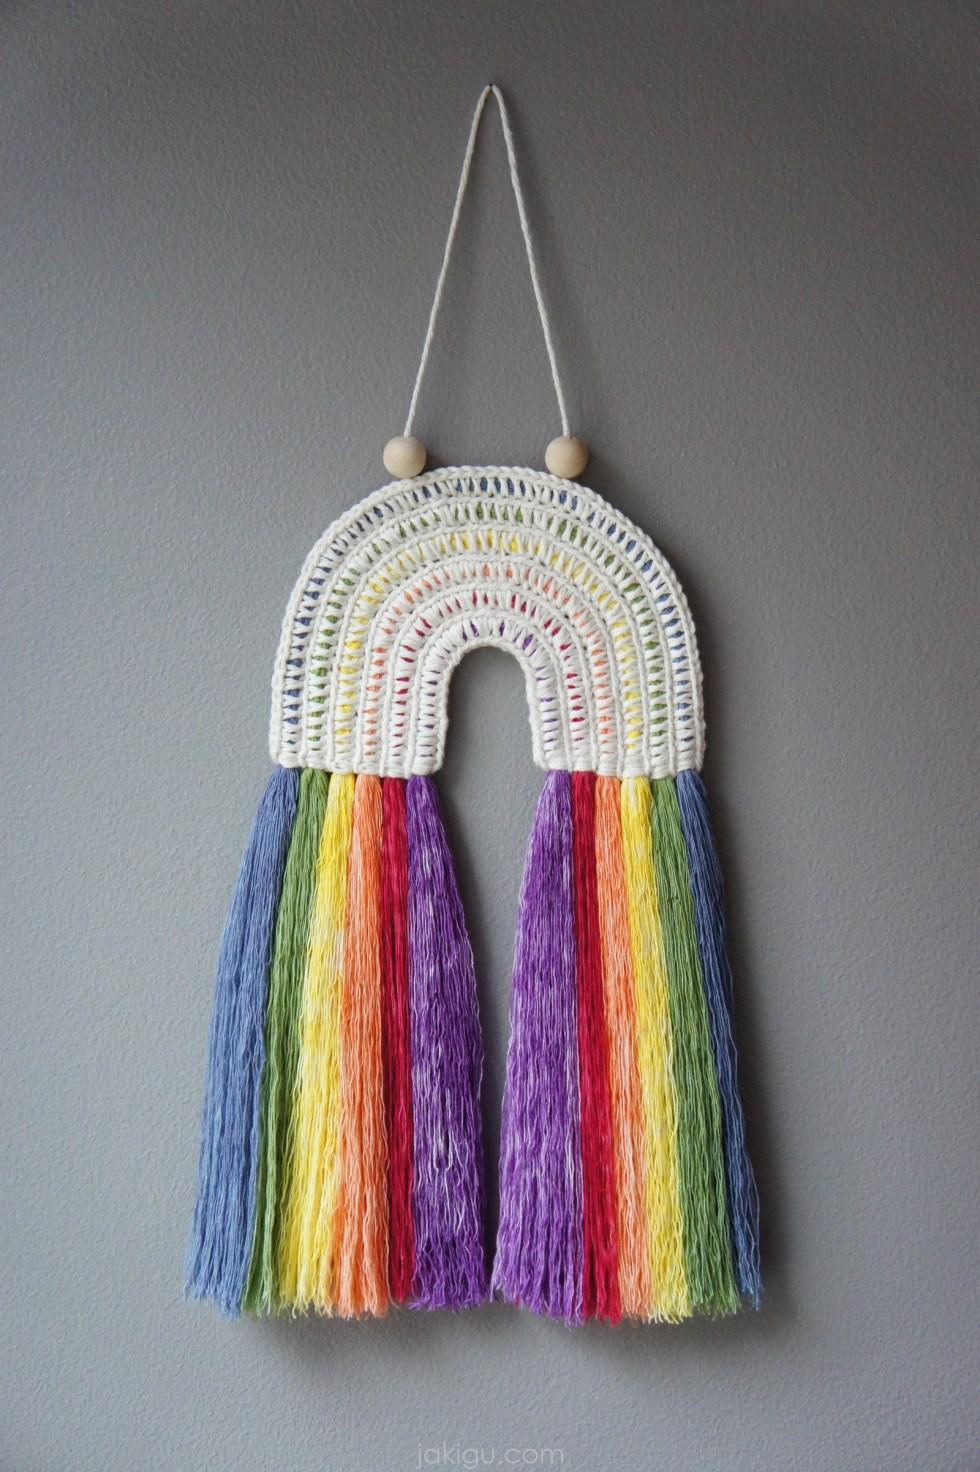 jakigu.com | Rainbow Crochet Wall Hanging | #macrachet